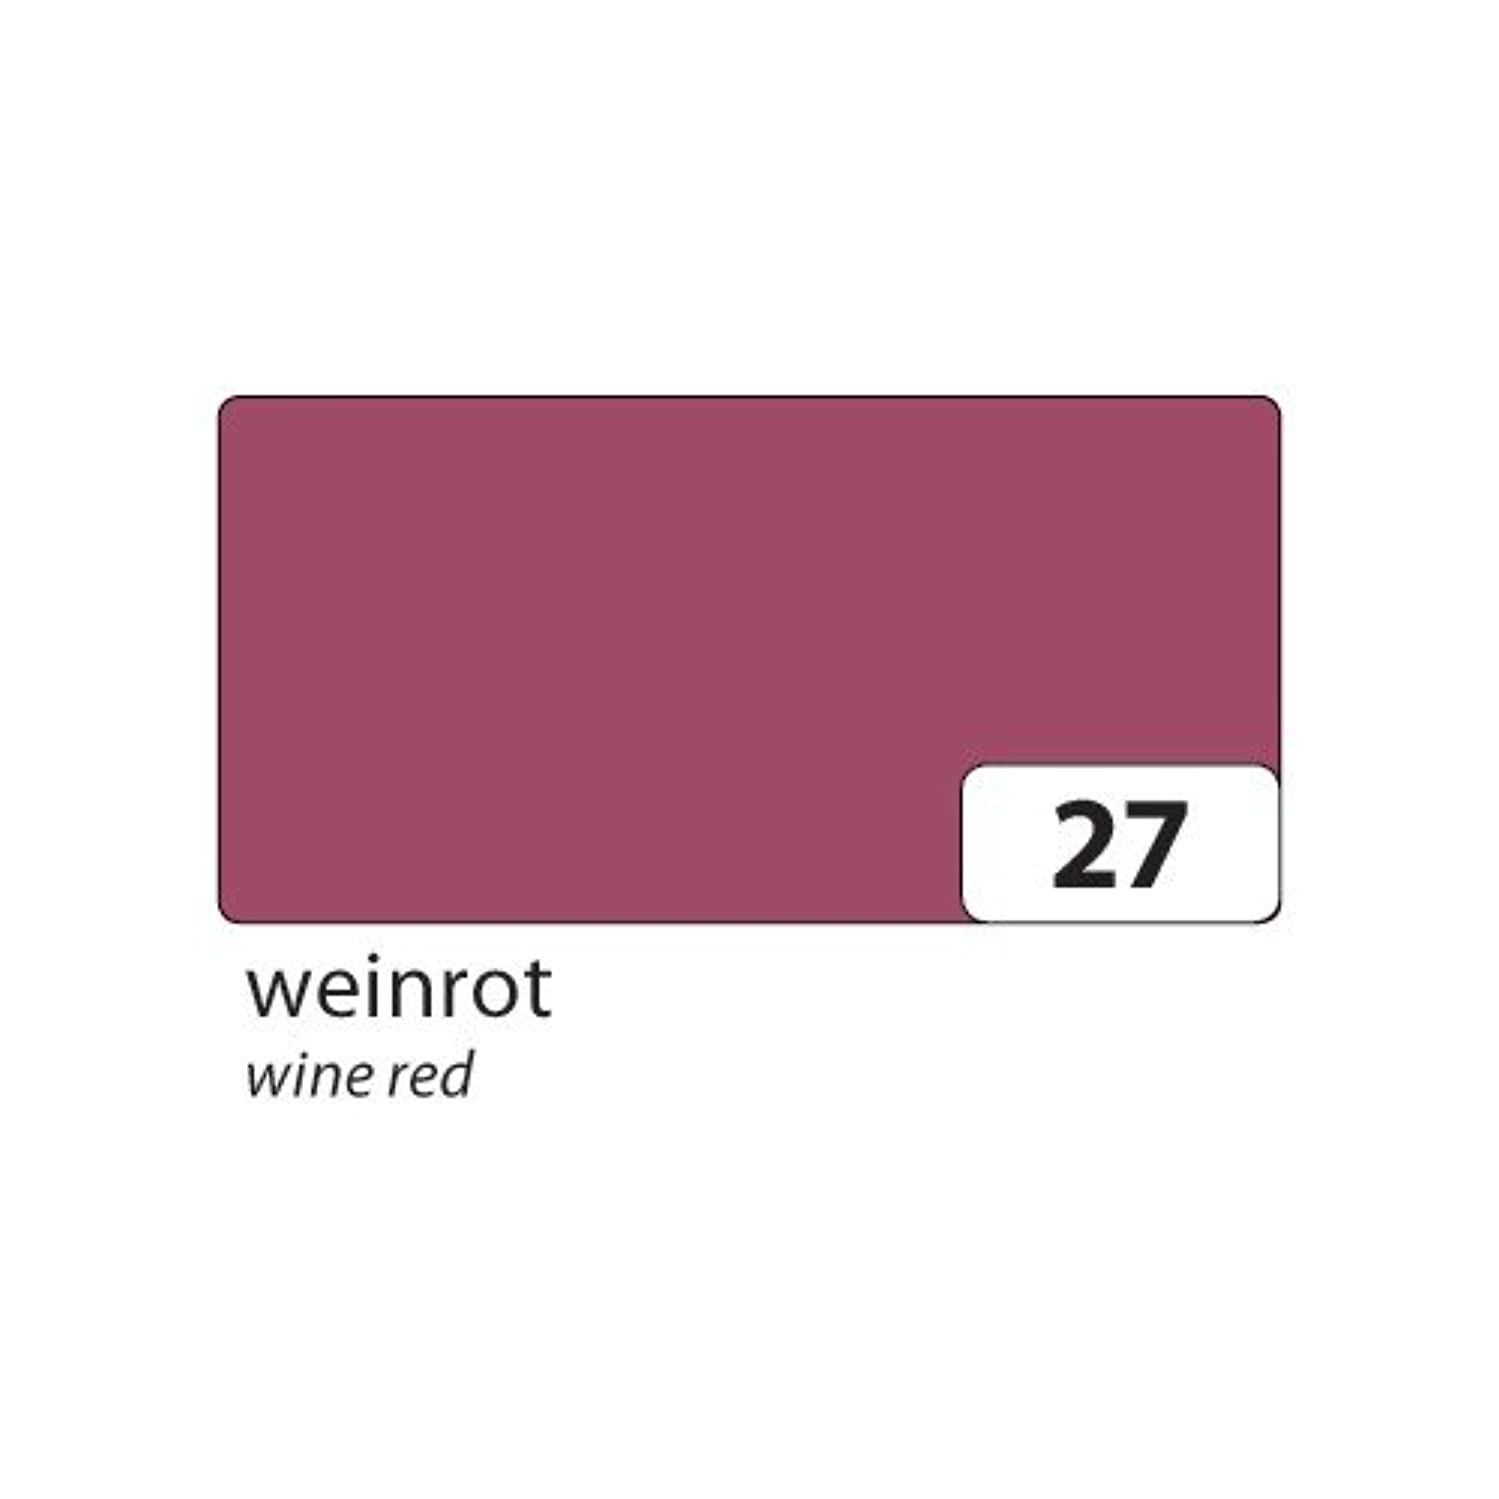 Folia Bringmann 6727?Coloured Paper 130?g/m2, 500?x 700?mm, Wine Red